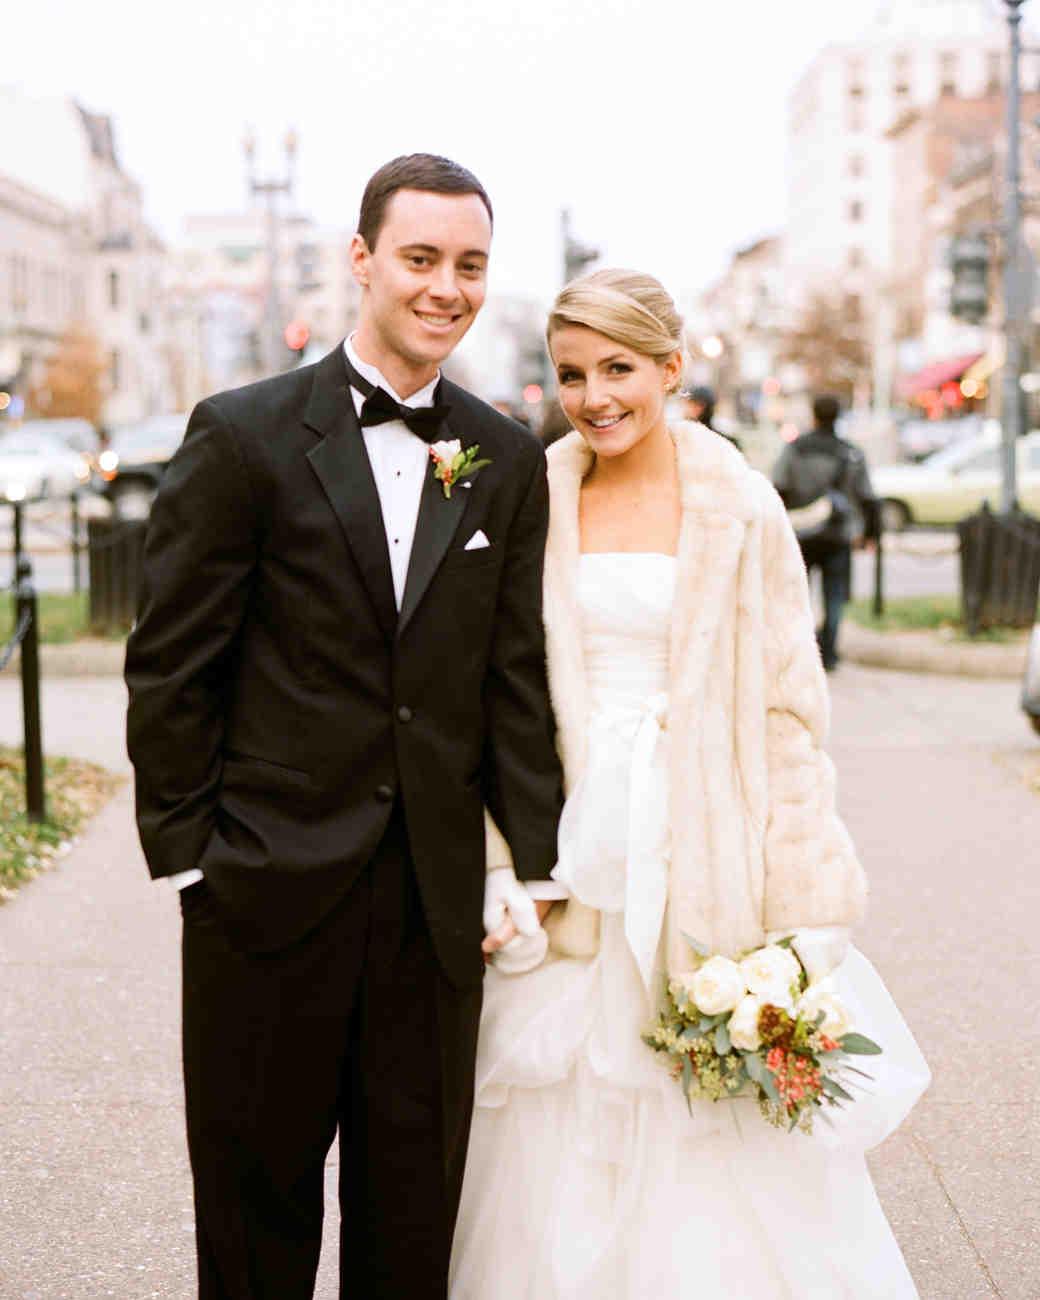 real-weddings-jess-greg-0811-442.jpg